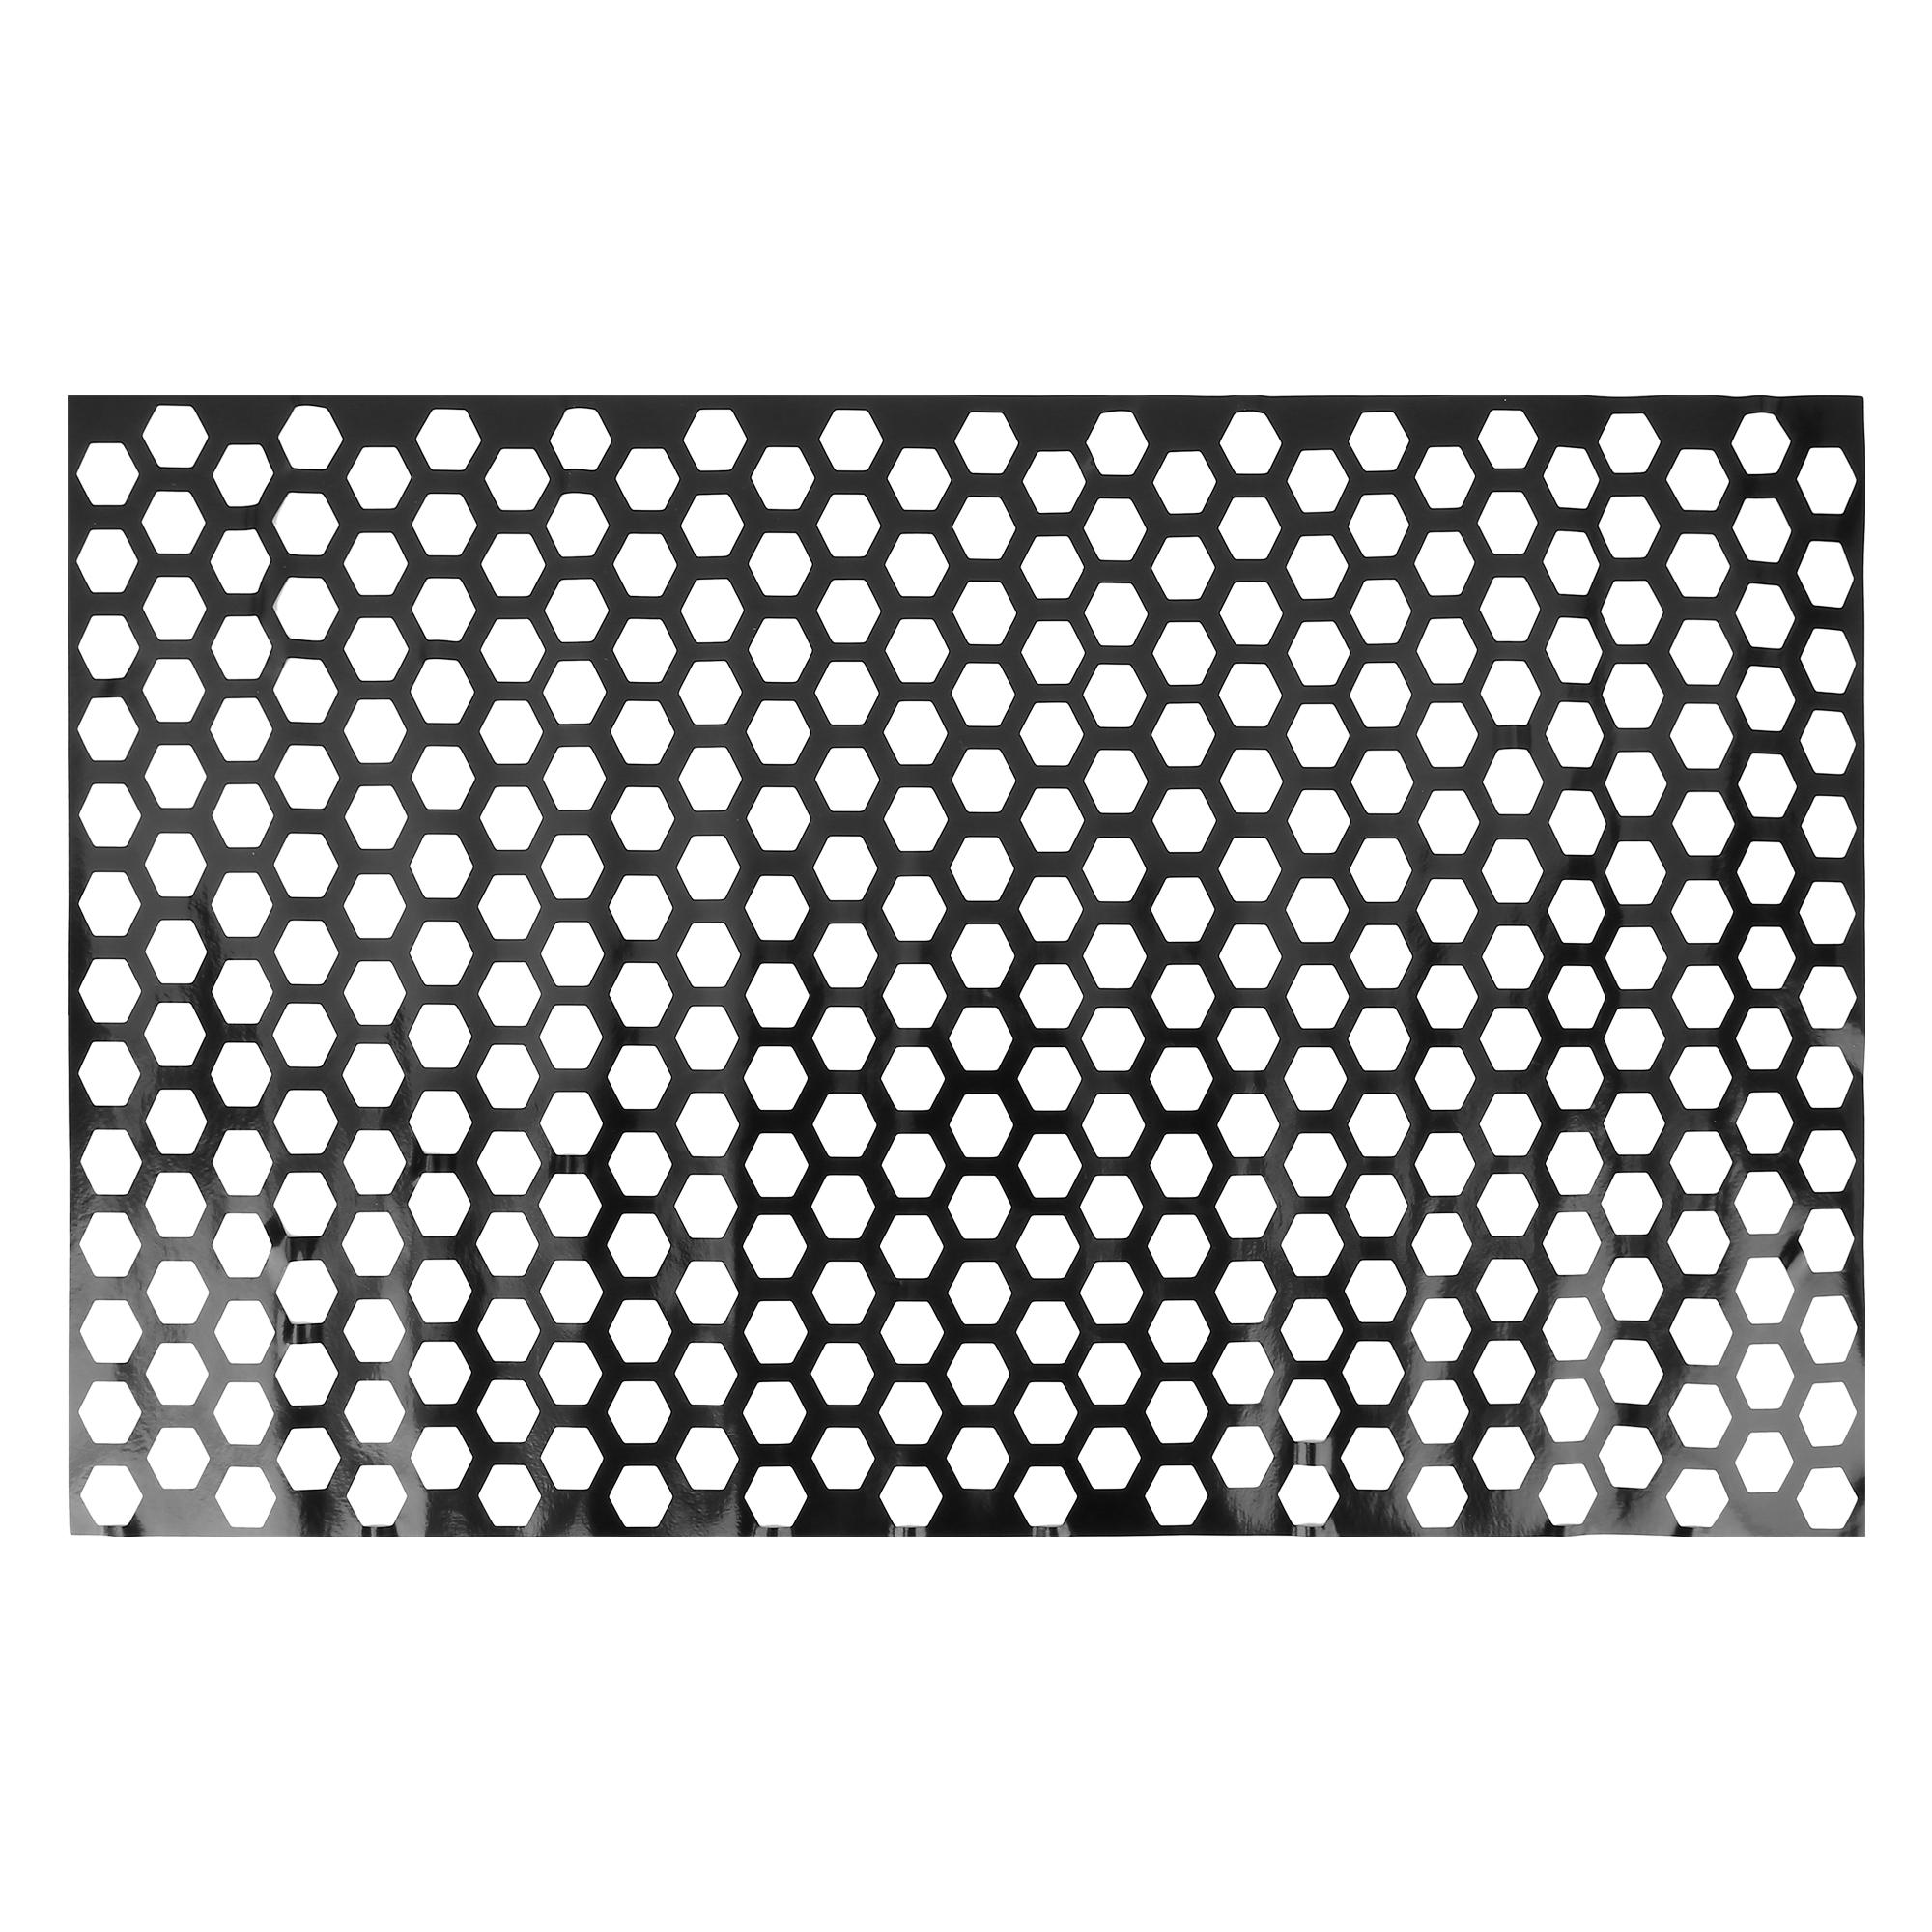 Universal Car Rear Tail Light Lamp Stickers Honeycomb Type Decal Black 48 x 30cm